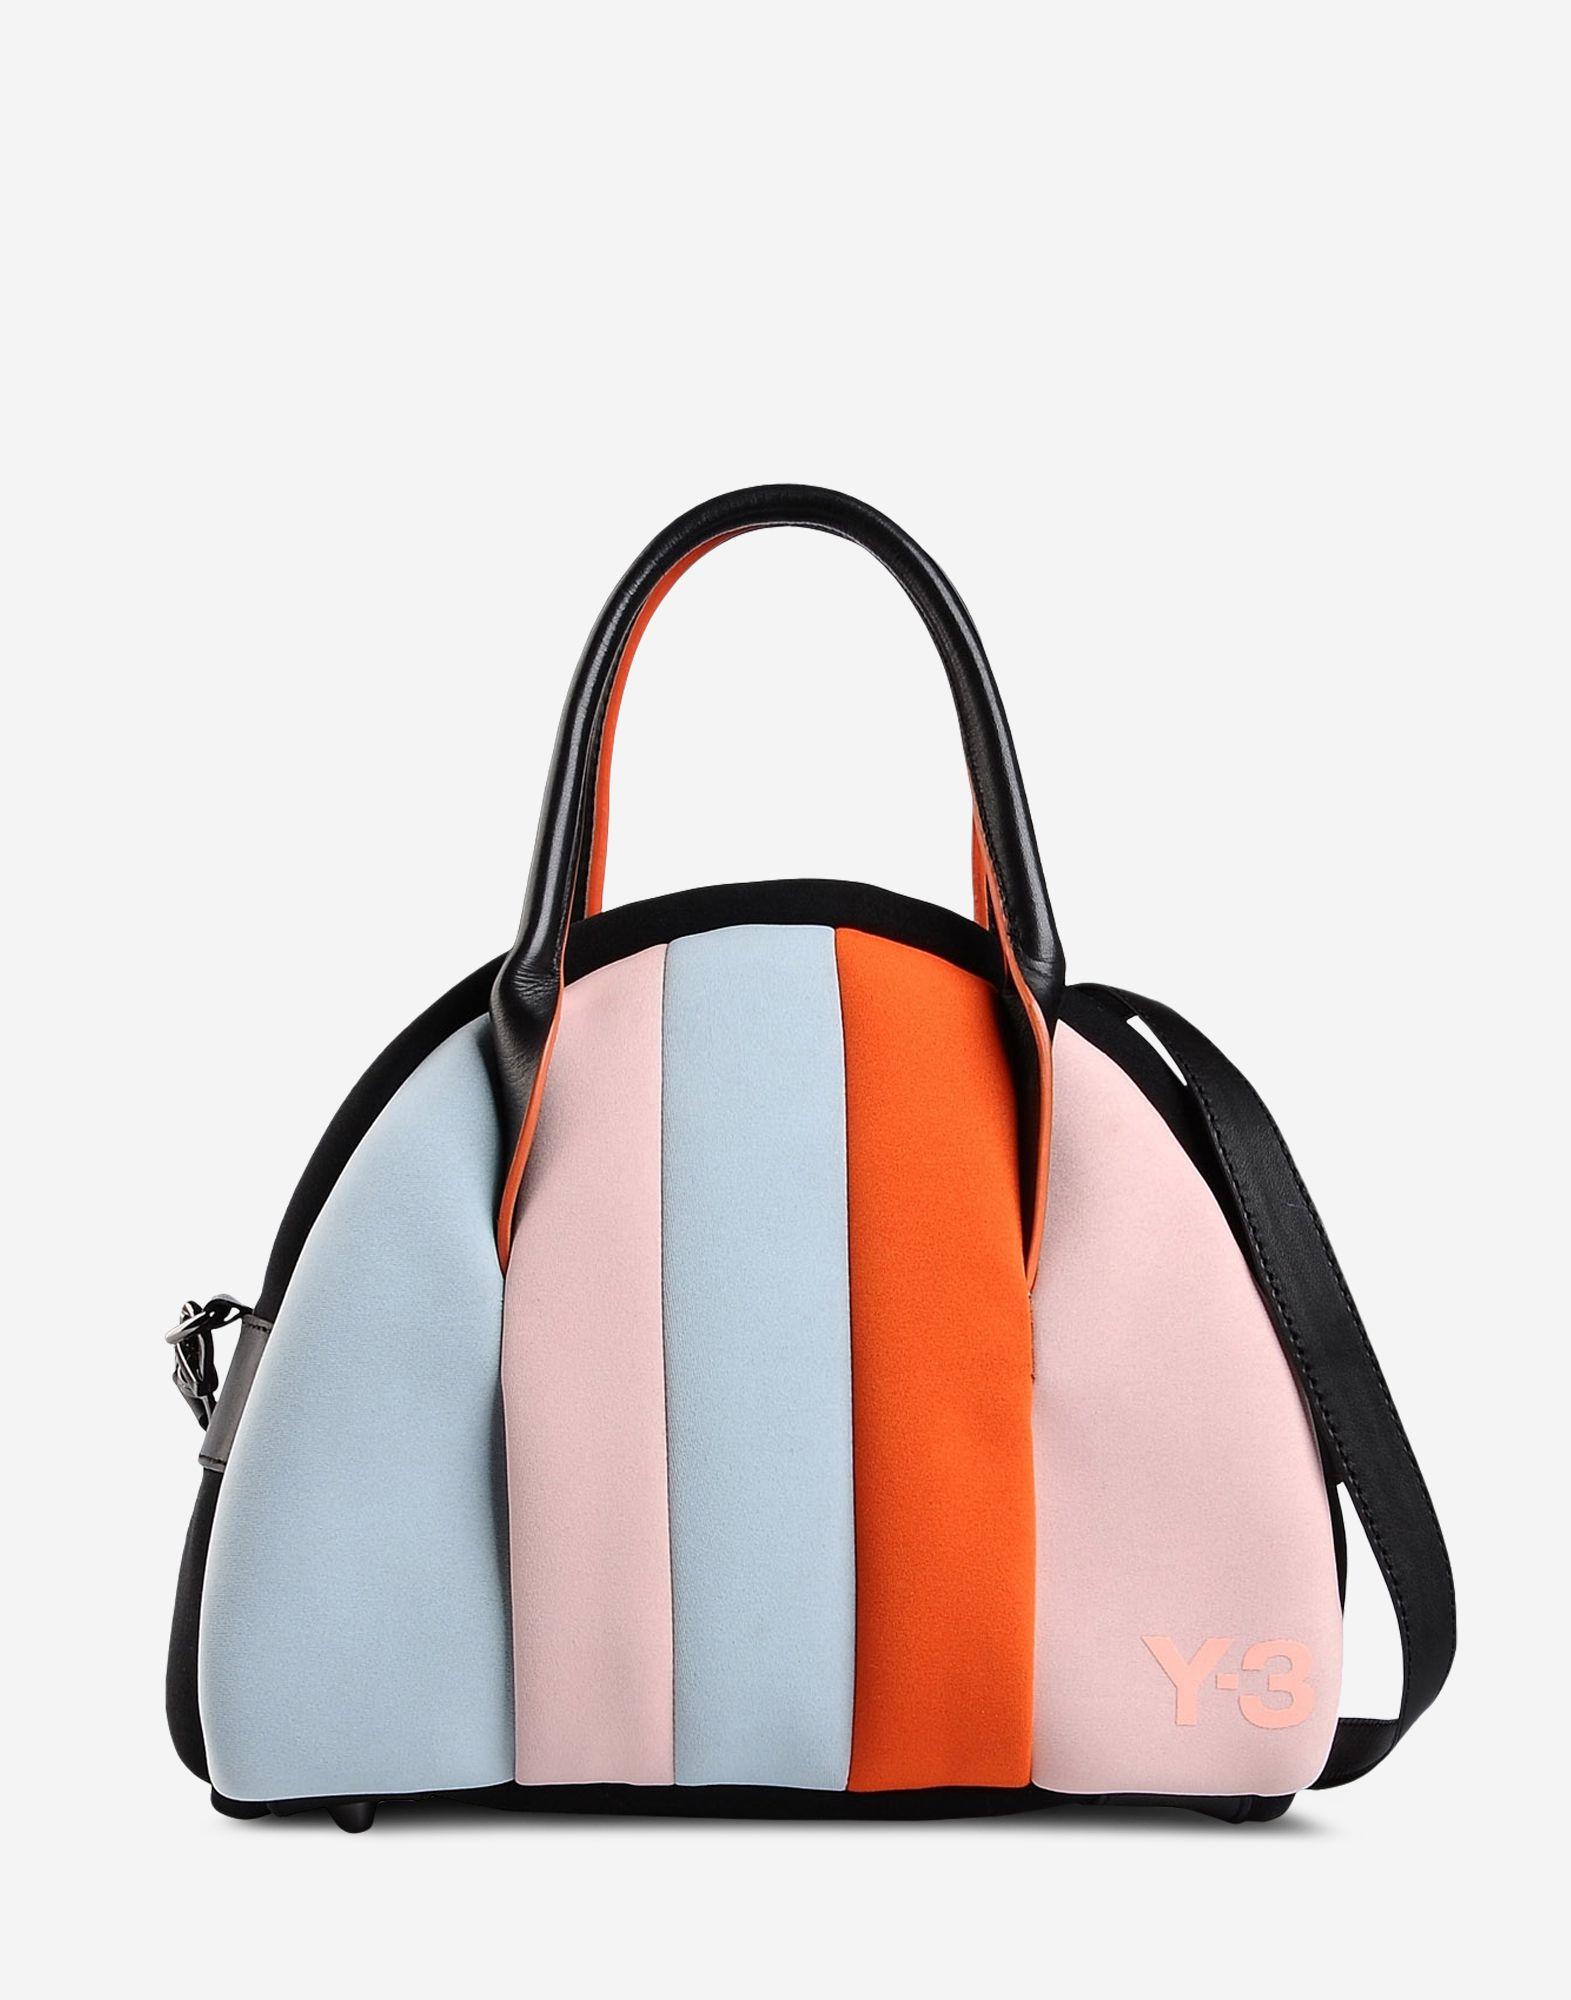 Luxury Adidas Shoulder Bag Womens  Lastest Pink Adidas Shoulder Bag Womens Image | Sobatapk.com